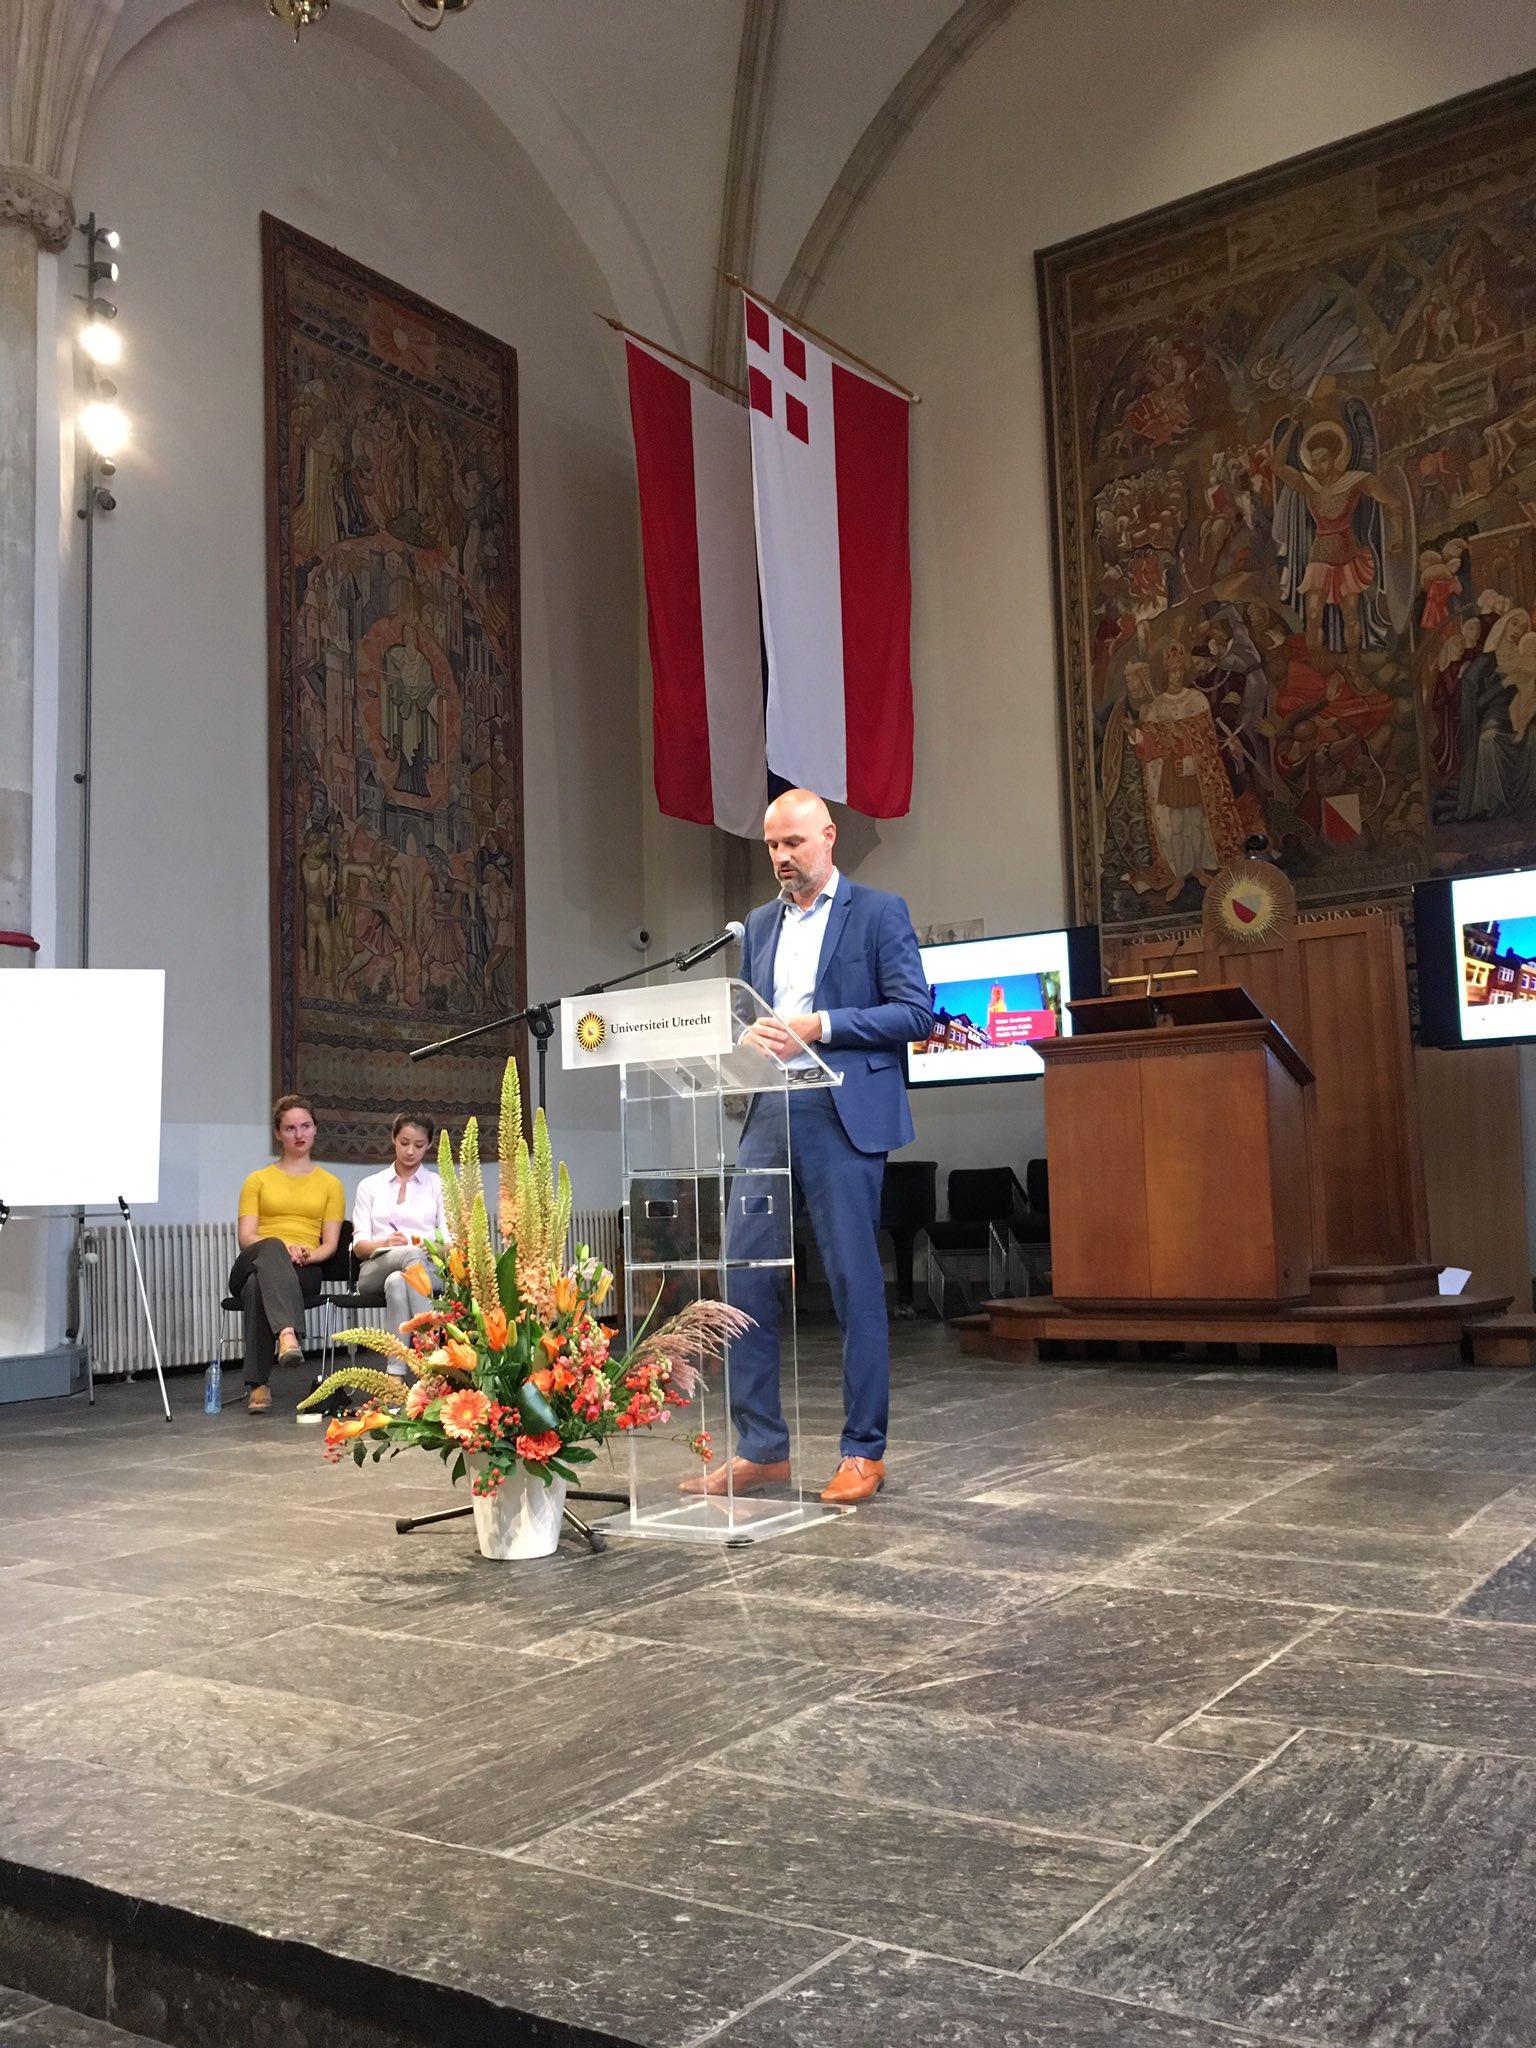 Victor Everhardt, Utrecht politician/wethouder on health nudges in schools and nudges facilitating safe cycling #NUDGE2017 https://t.co/jbAvor3iXv